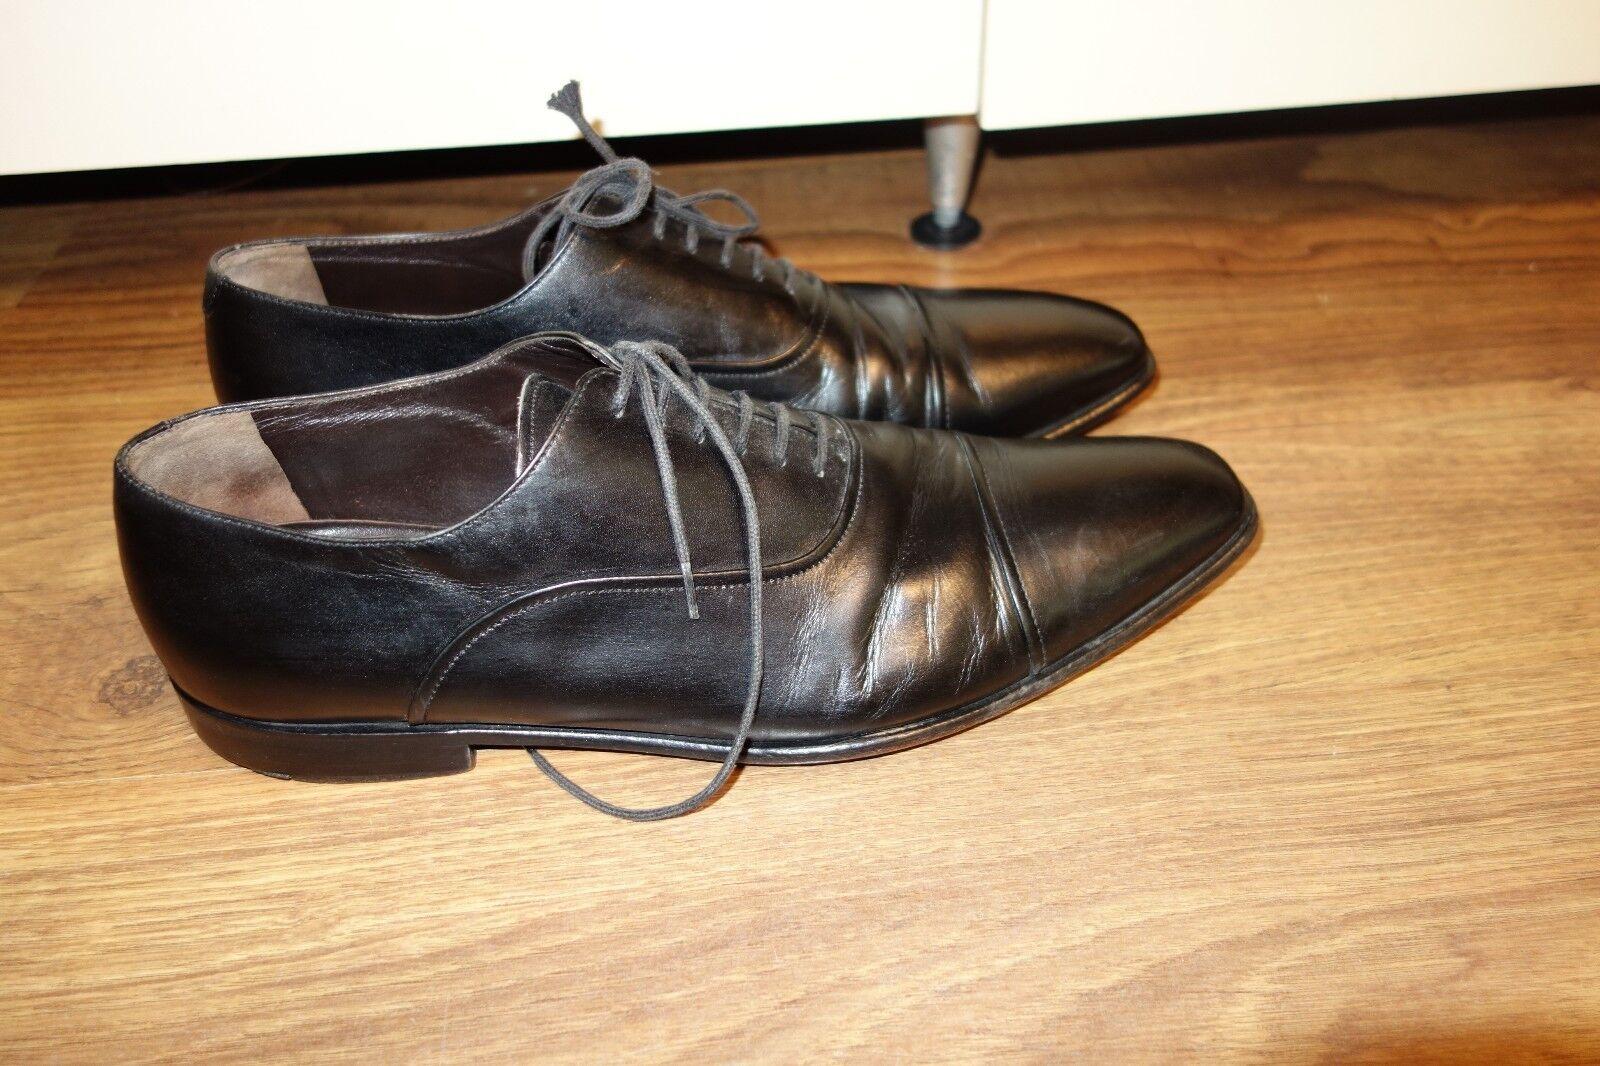 GREAT PAL ZILERI schuhe, LEATHER schwarz, schwarz, schwarz, Größe UK 9.5 E, US 10, EU 44, VERY GOOD cfa632